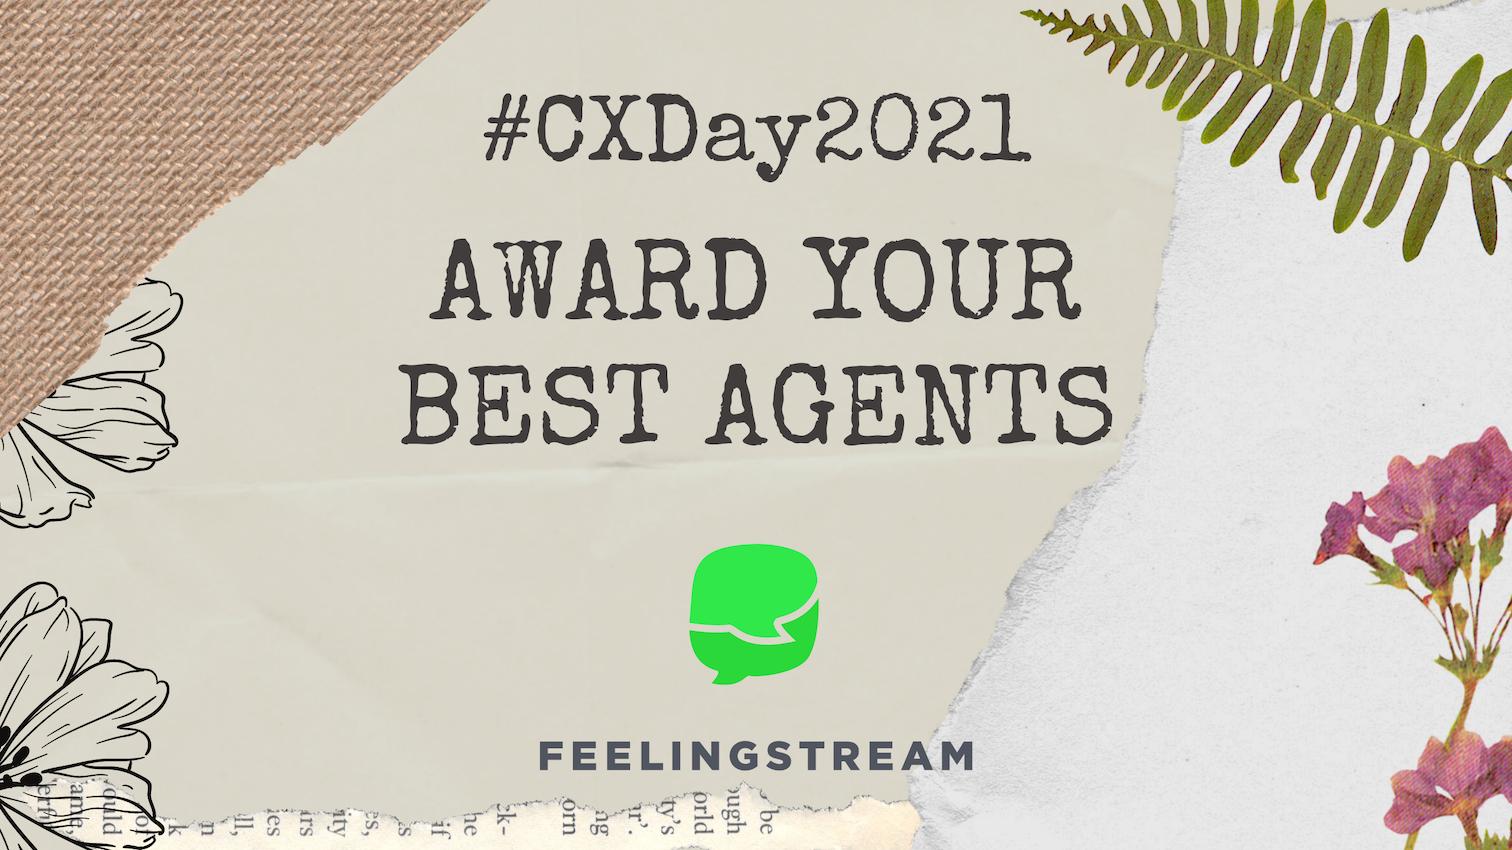 CXDay2021_post